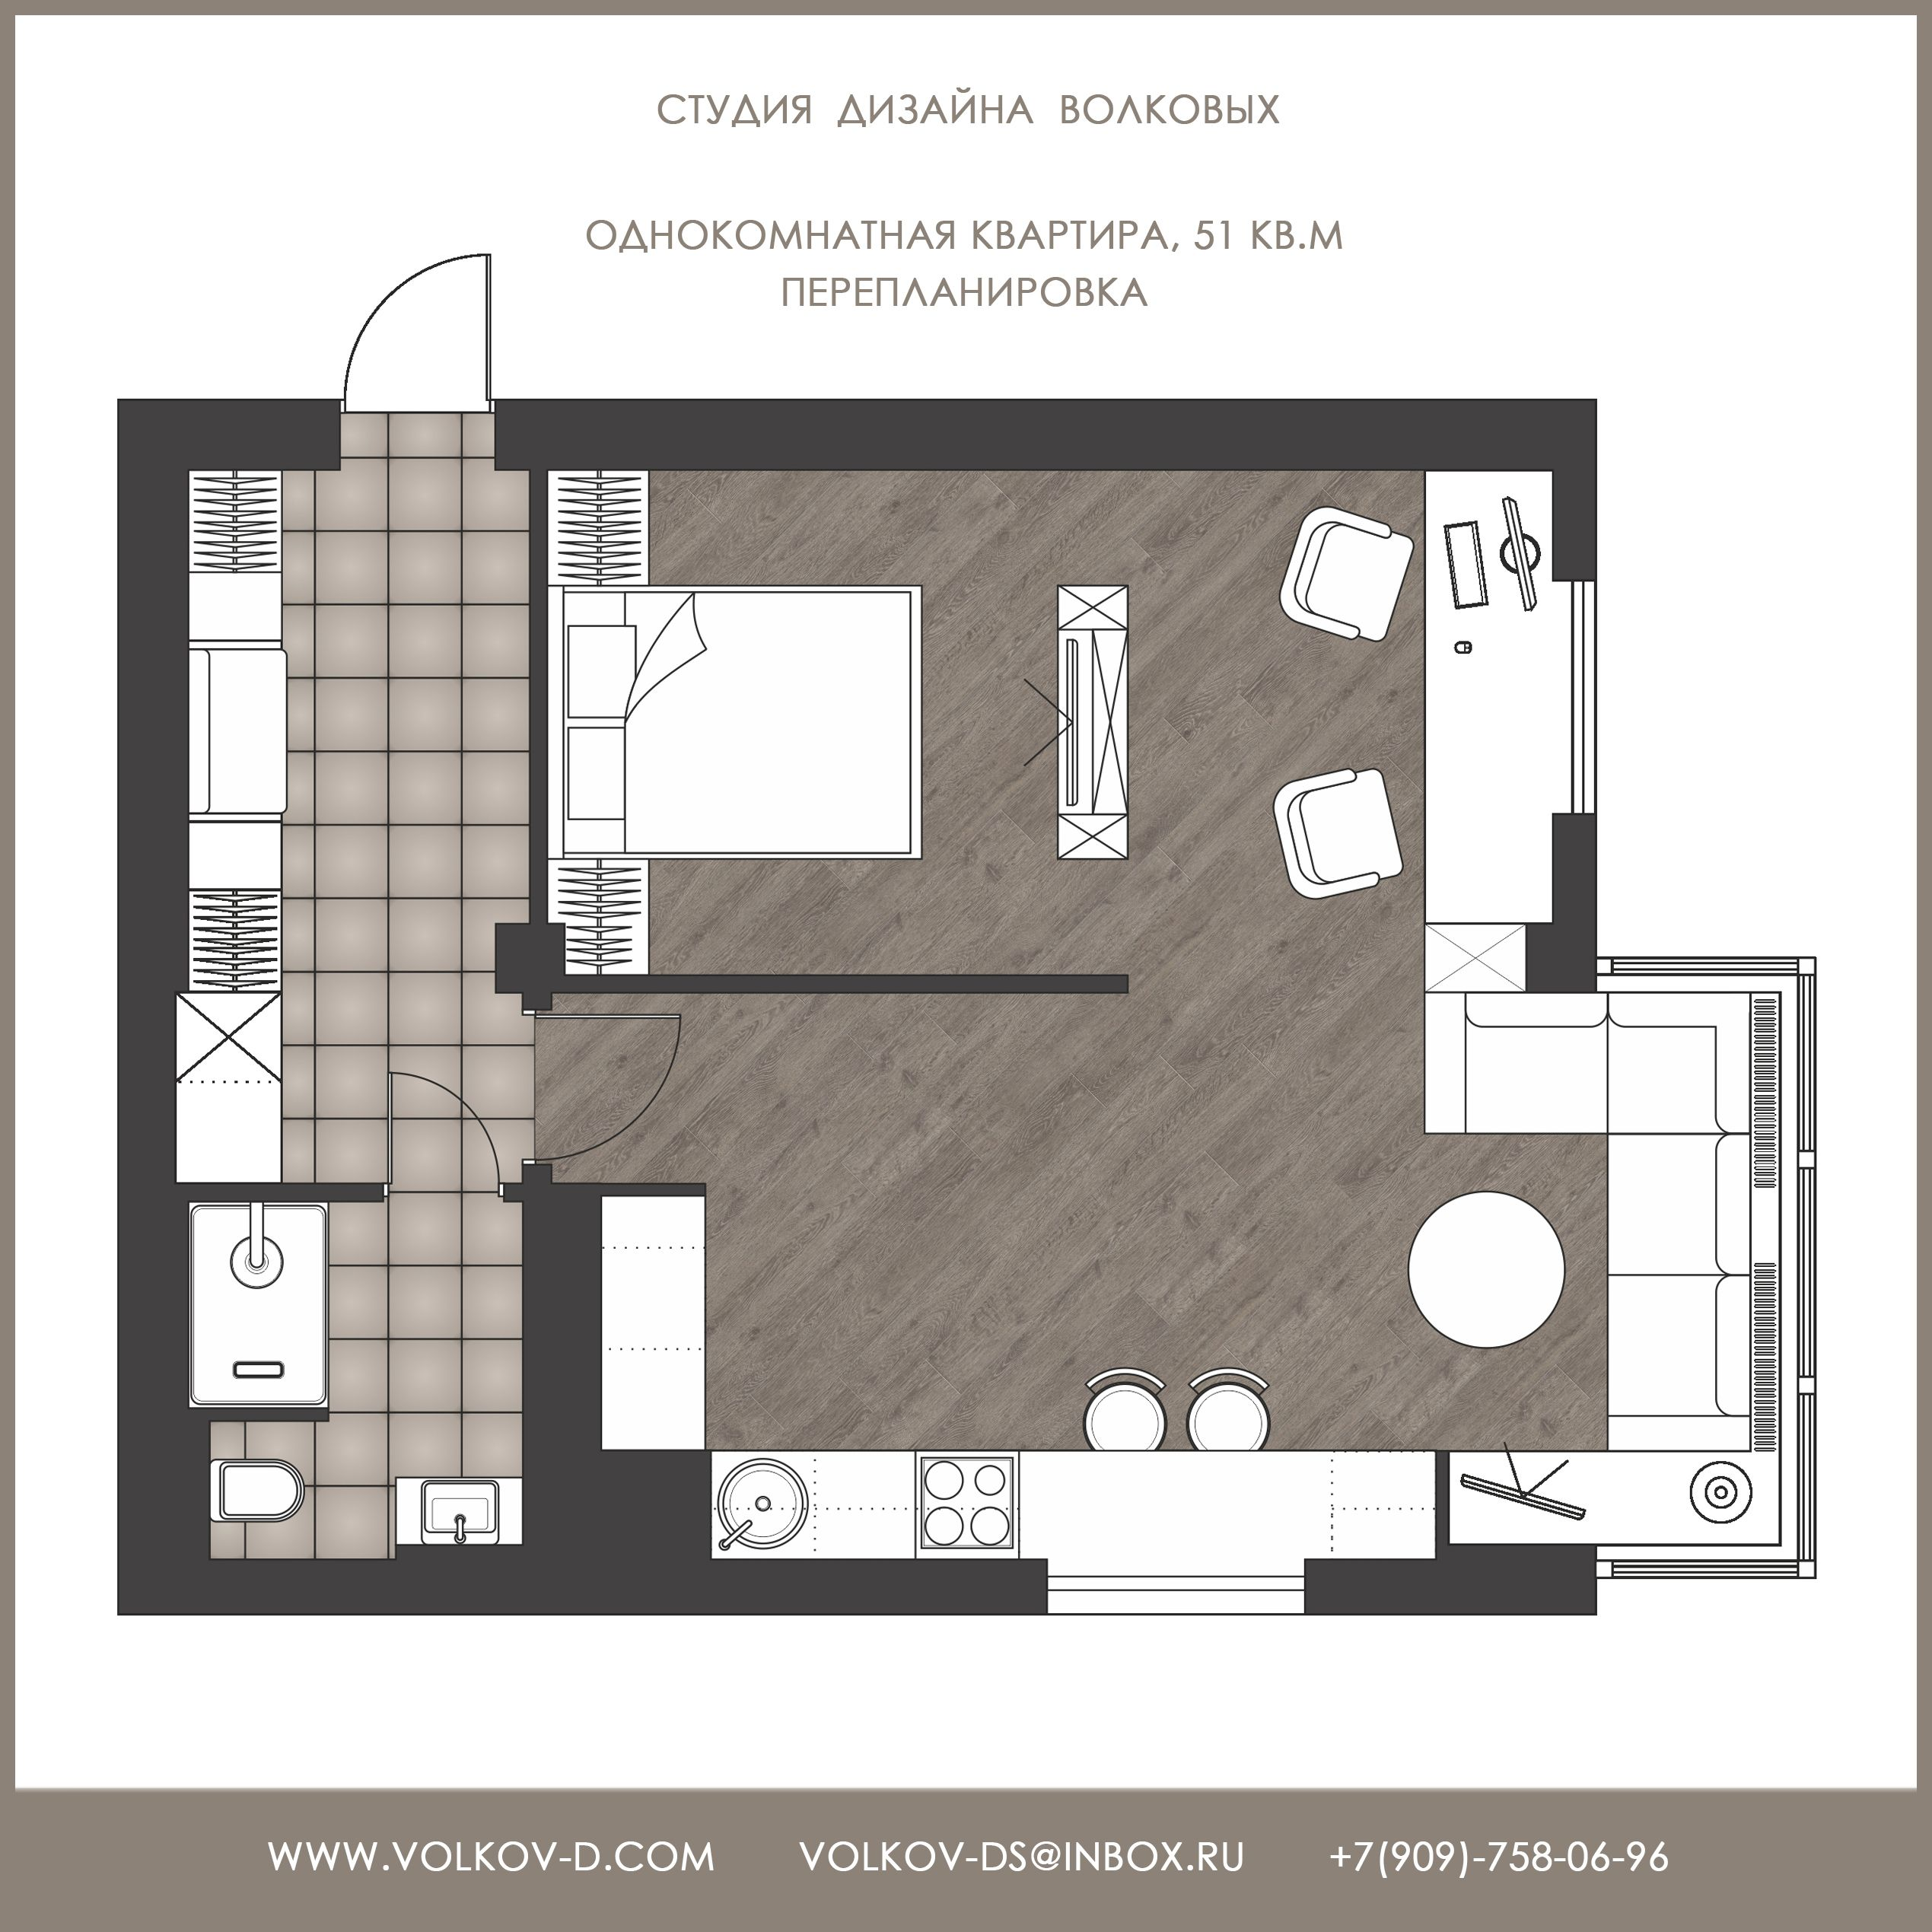 Pin By Yury Volkov On Planirovka Layout Condo Floor Plans Floor Plan Design Floor Plans